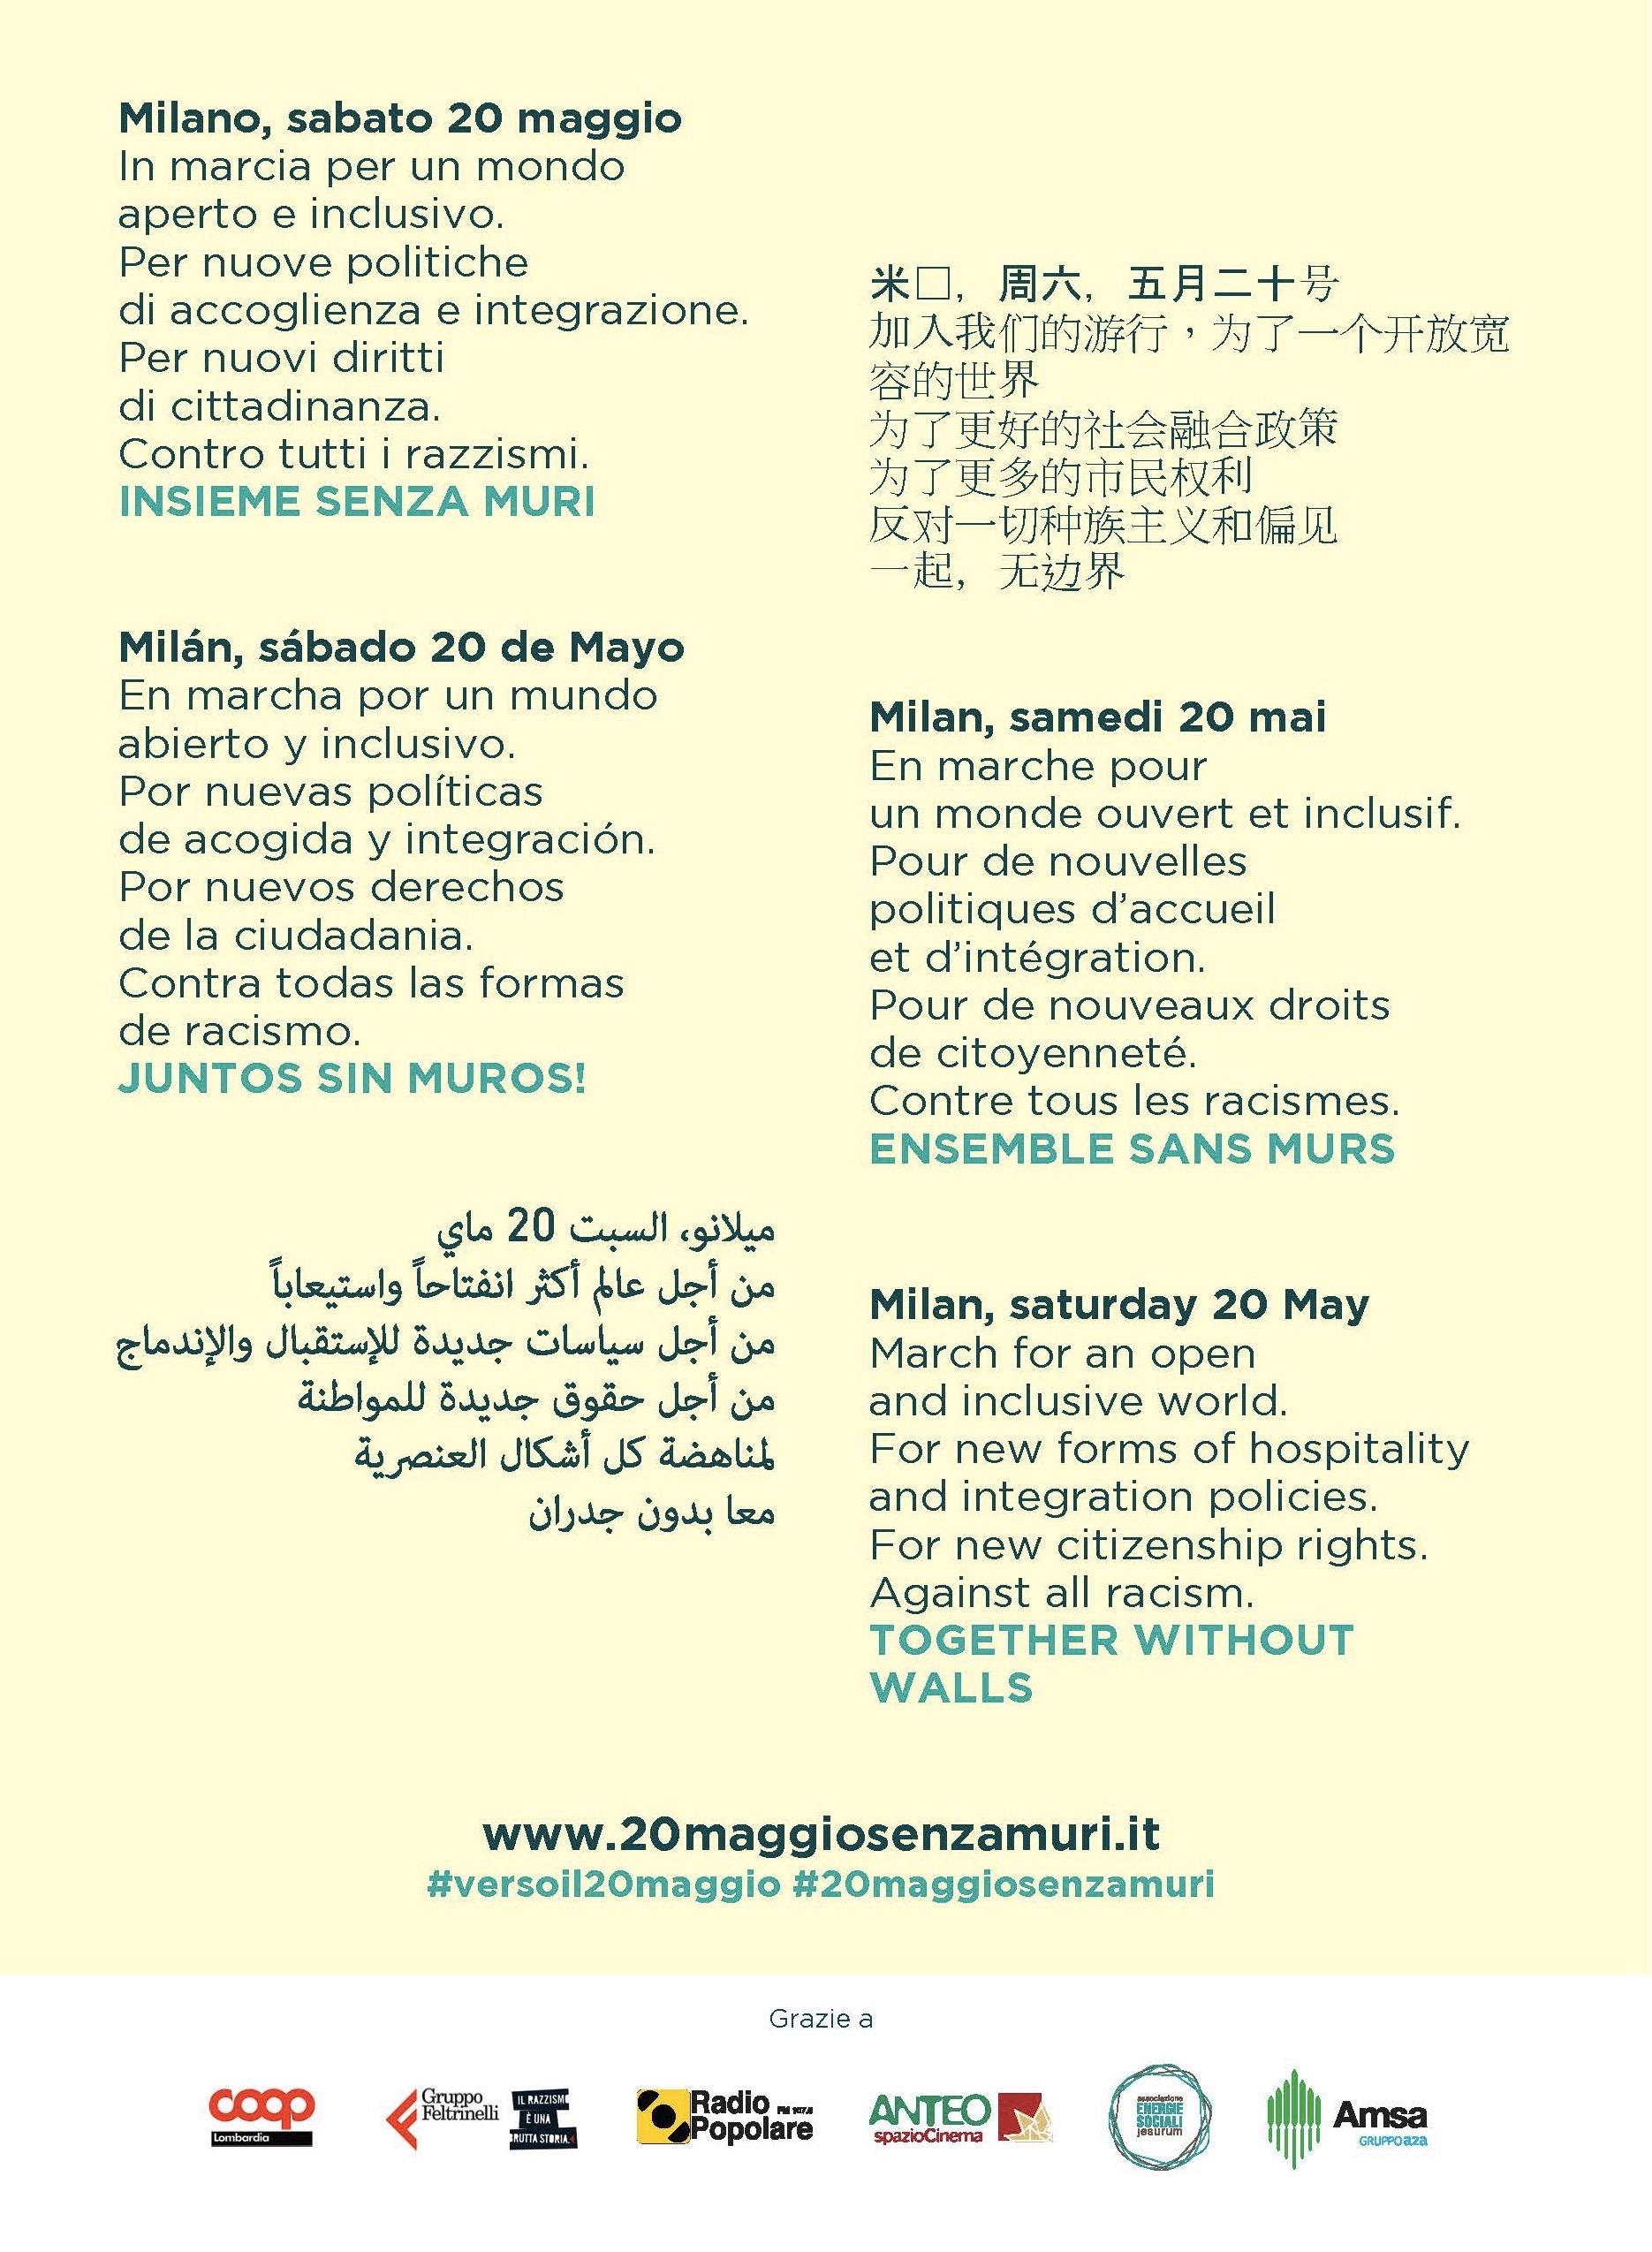 20 maggio - Insieme senza muri